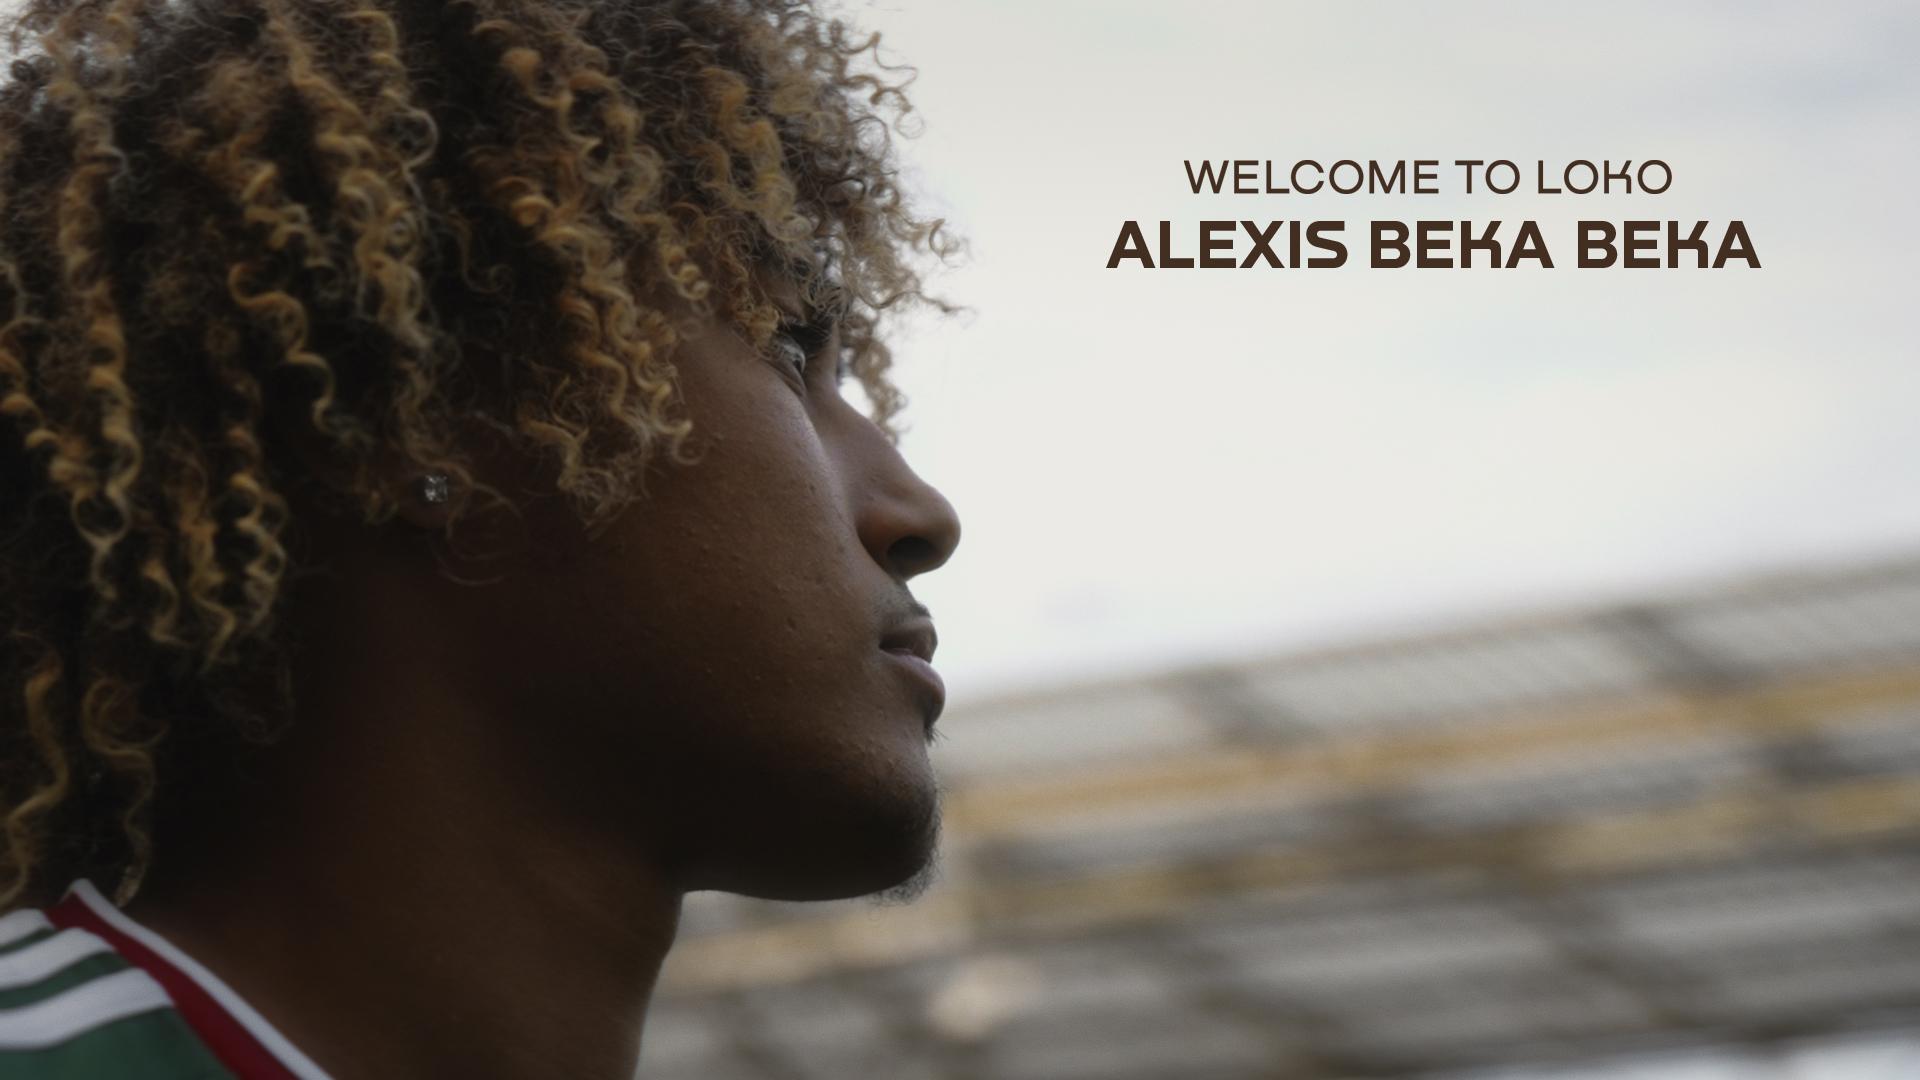 WELCOME TO LOKO // Алексис Бека Бека №8